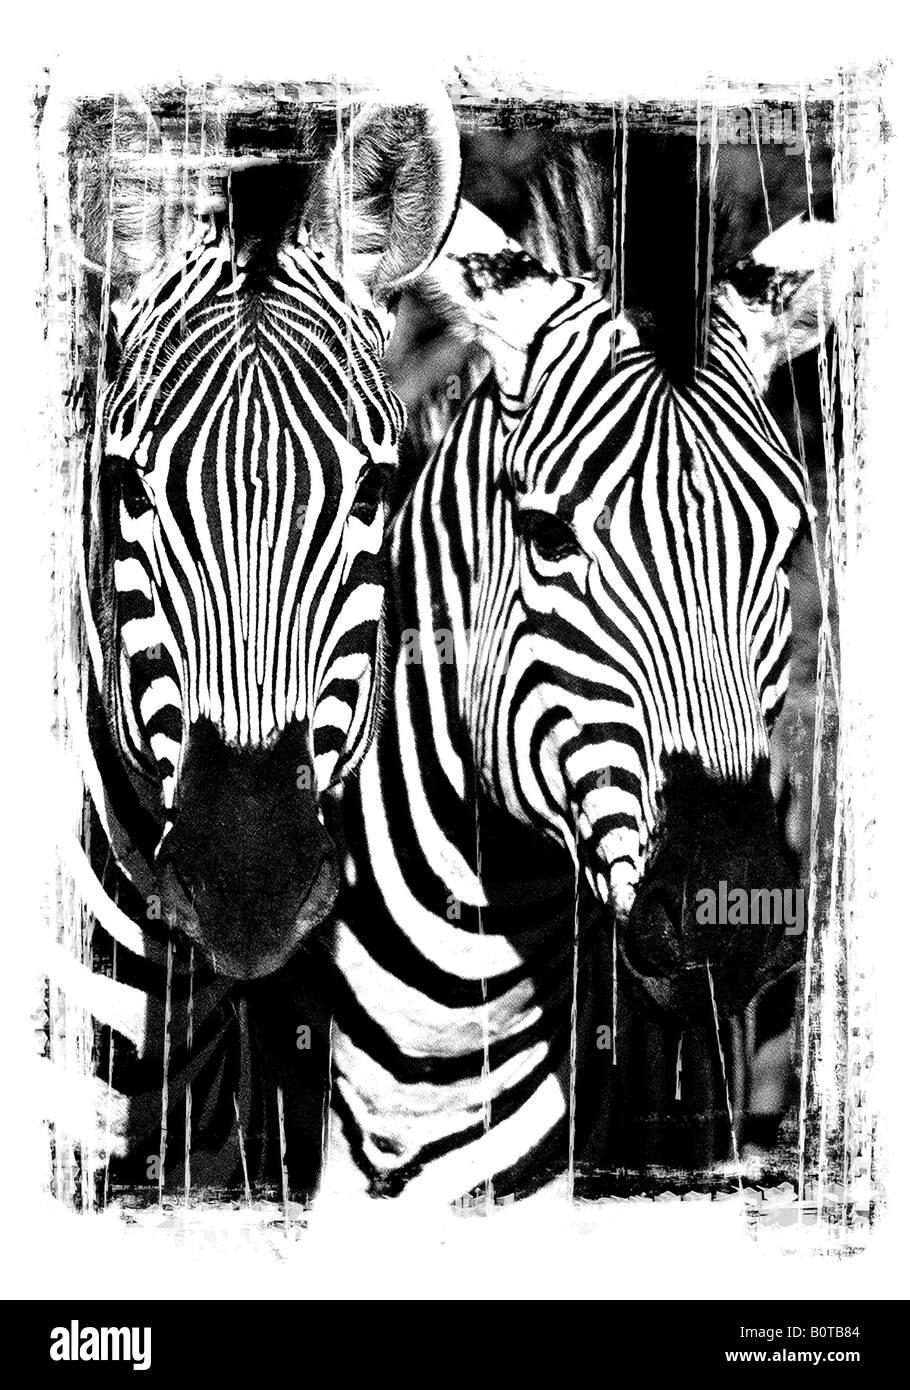 Burchell's Zebra, Equus quagga burchellii - Stock Image